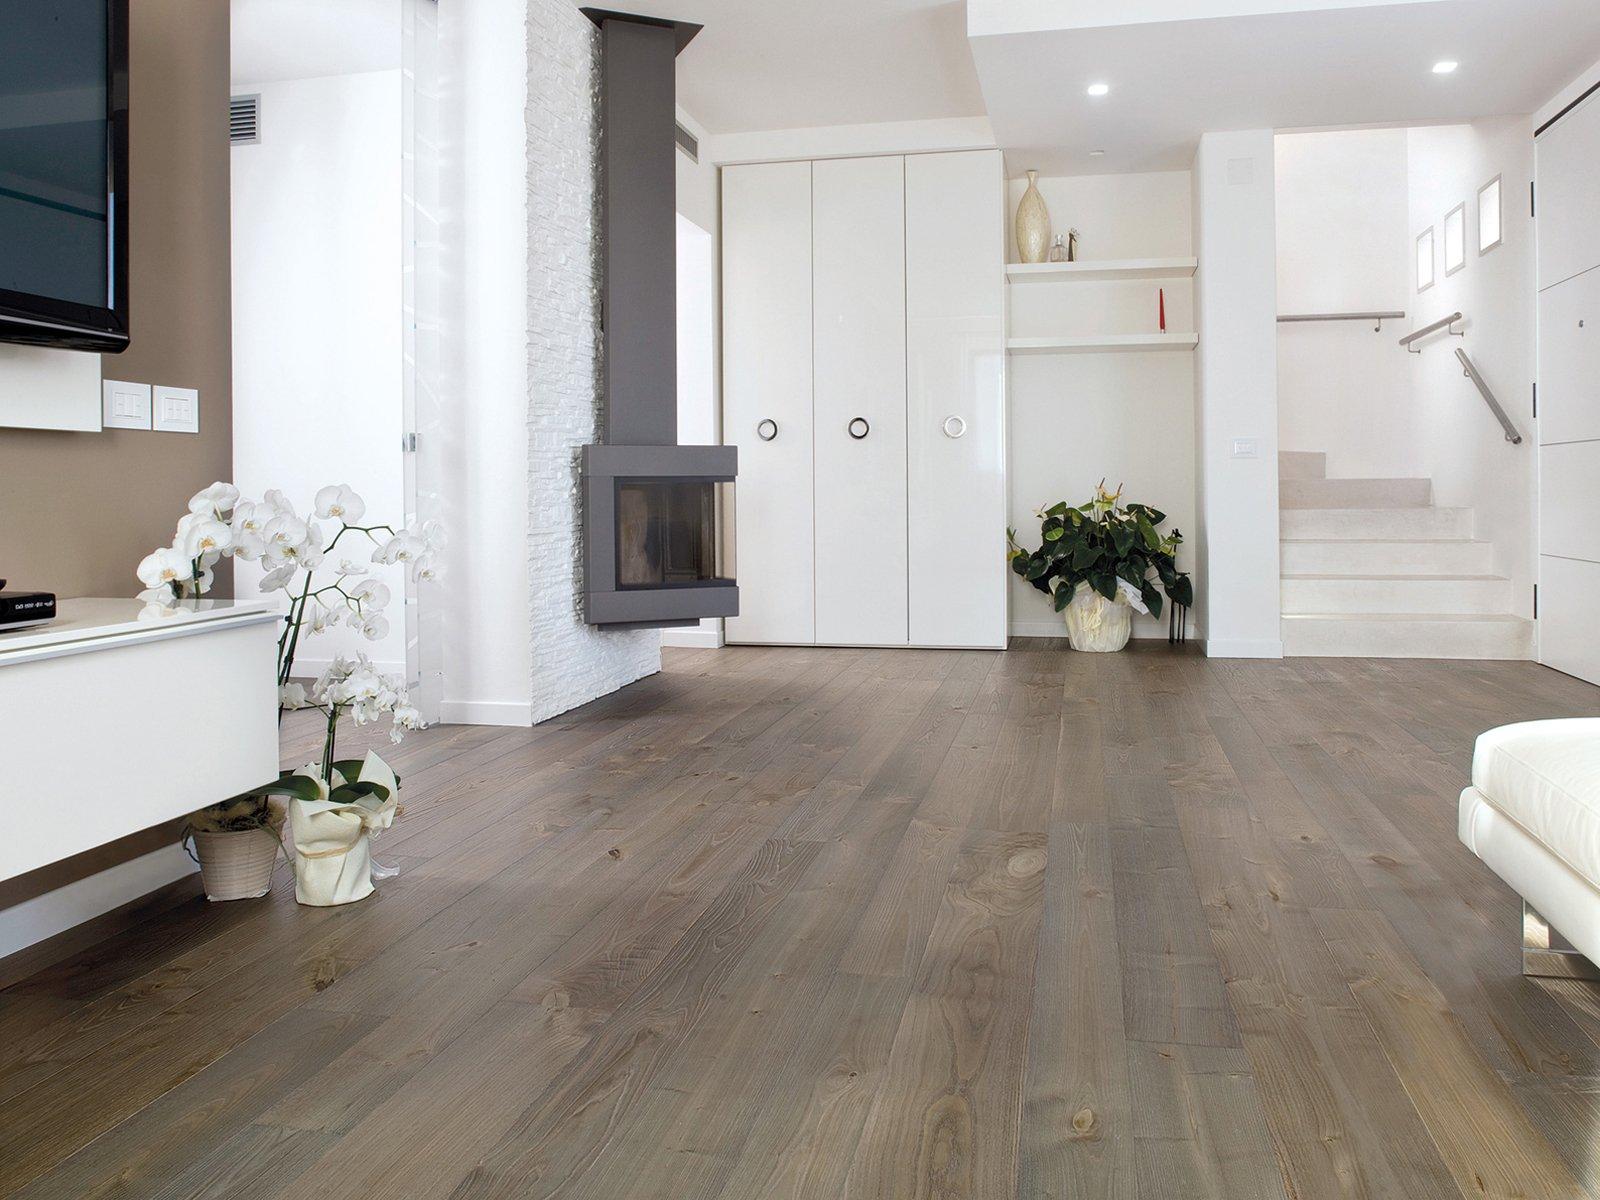 Parquet, essenze e tipologie - Cose di Casa